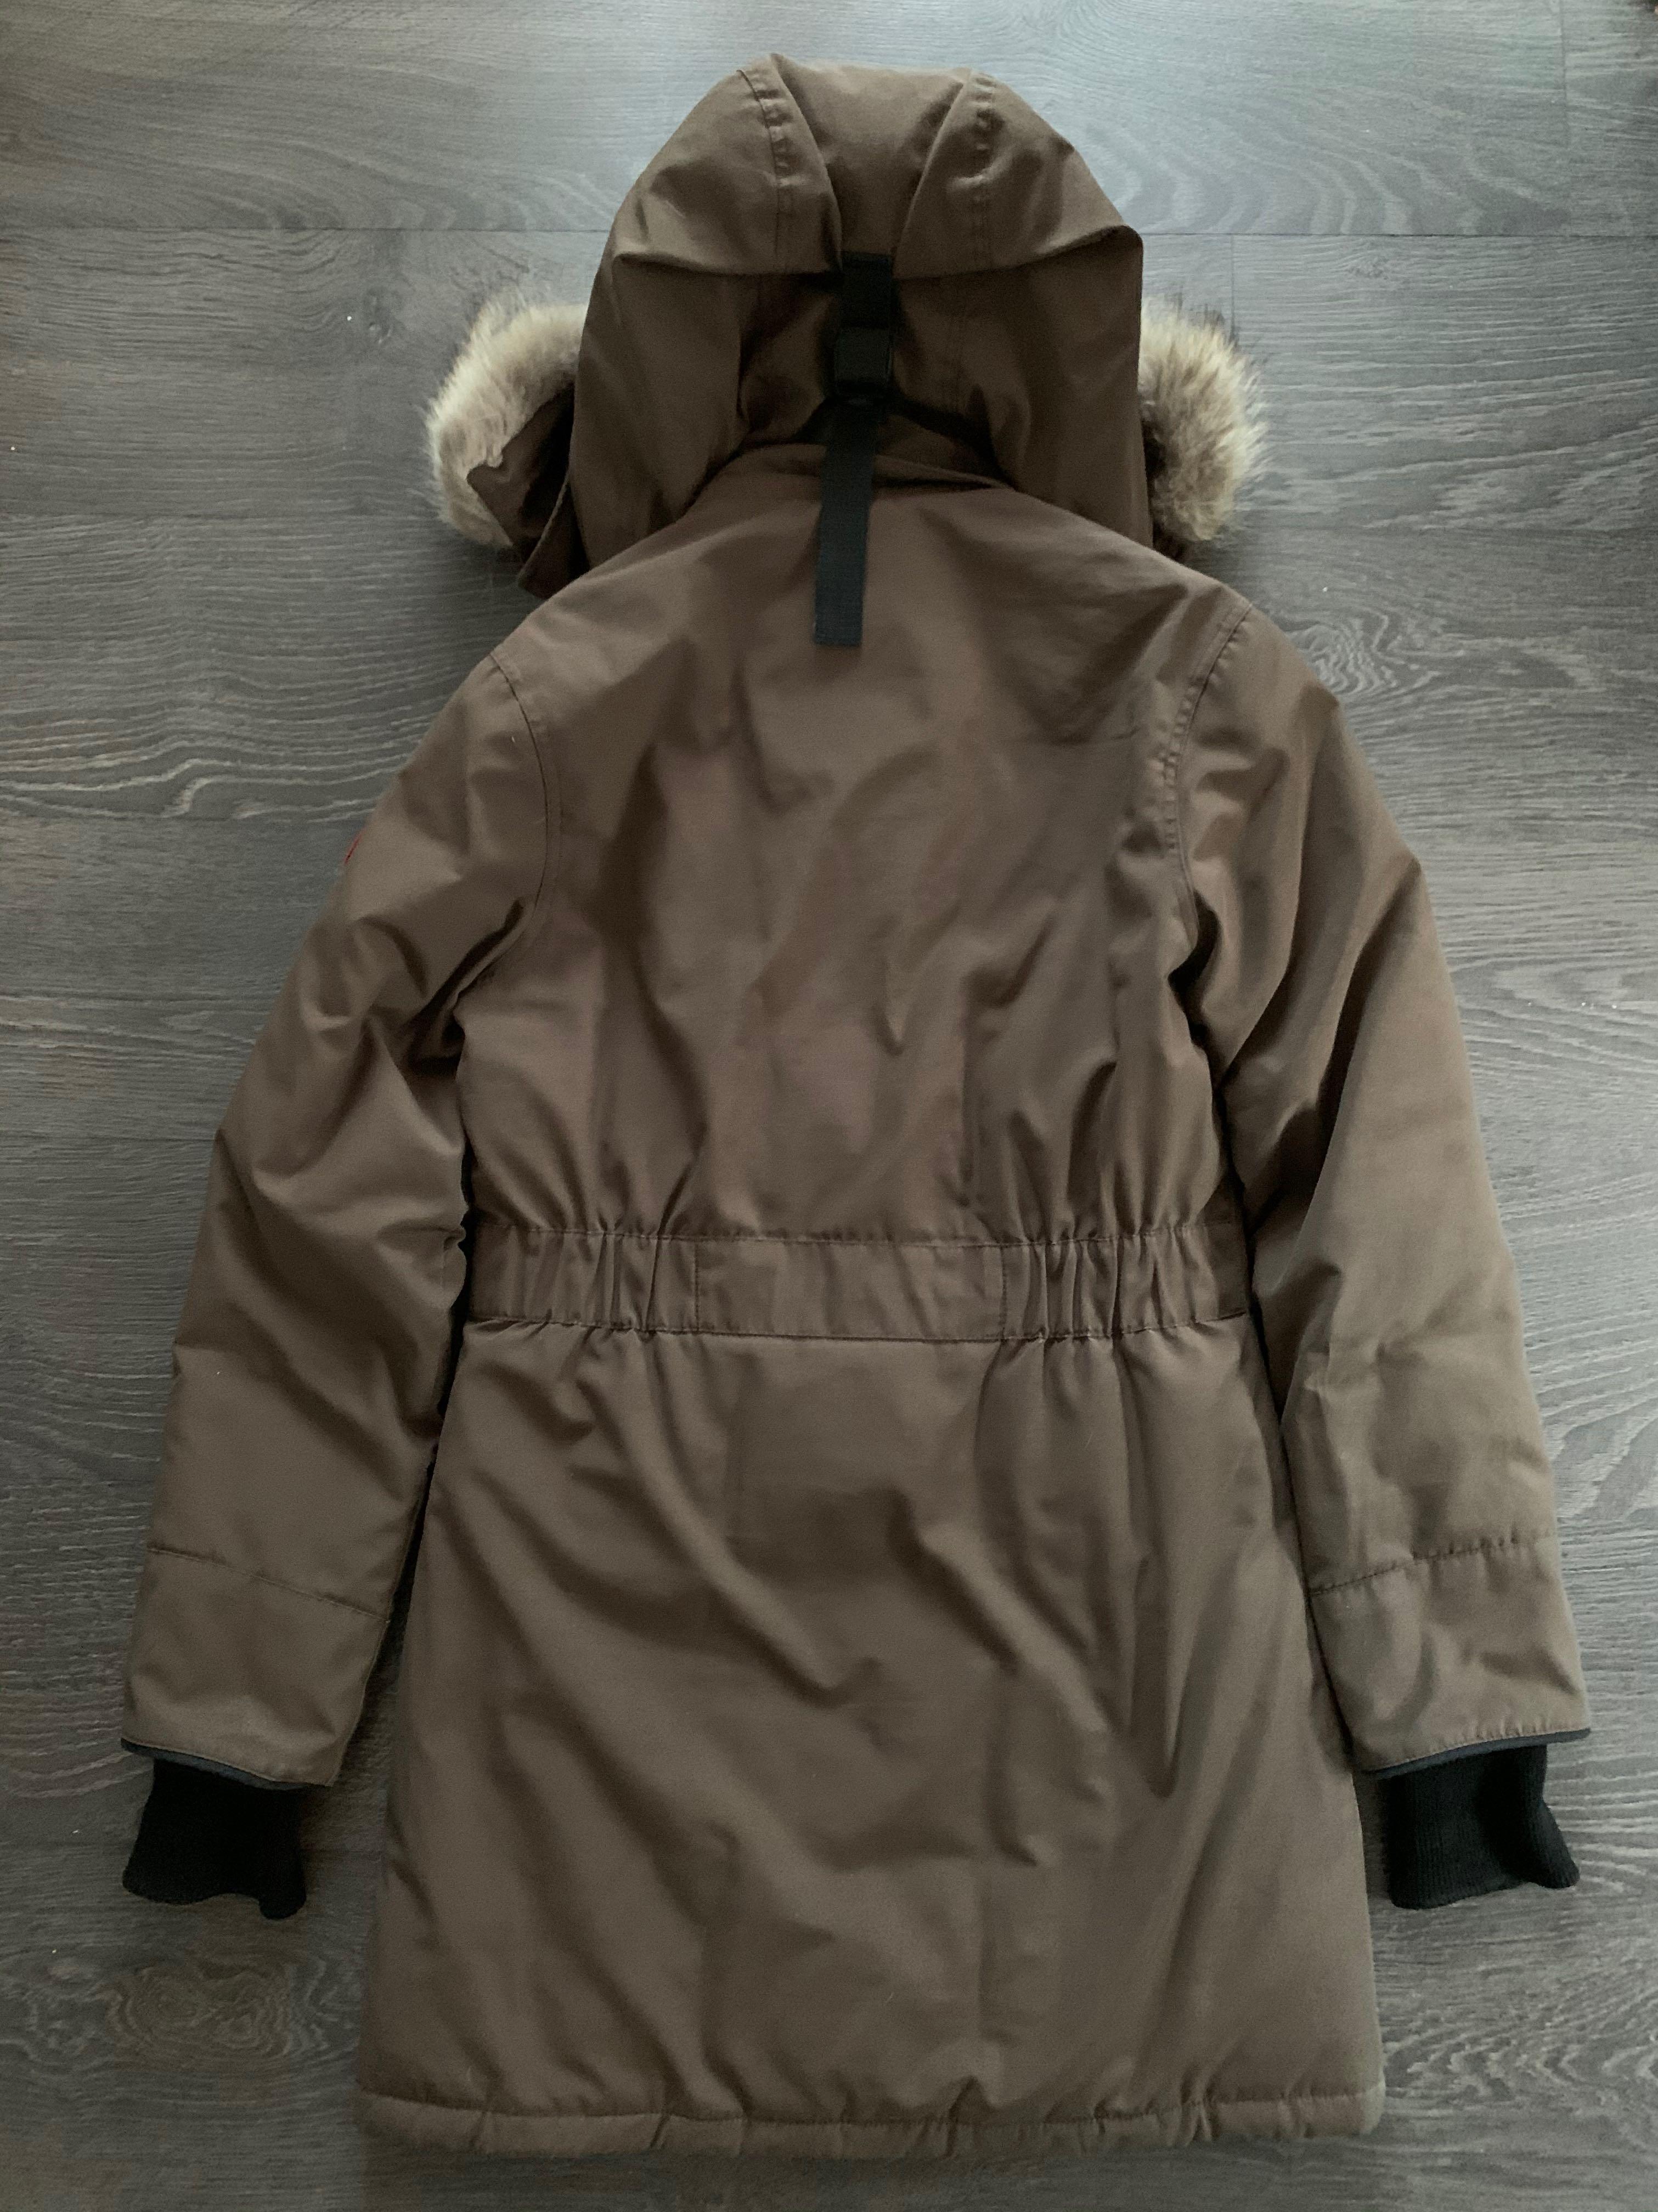 AUTHENTIC Canada Goose Trillium Jacket in Brown Size XS